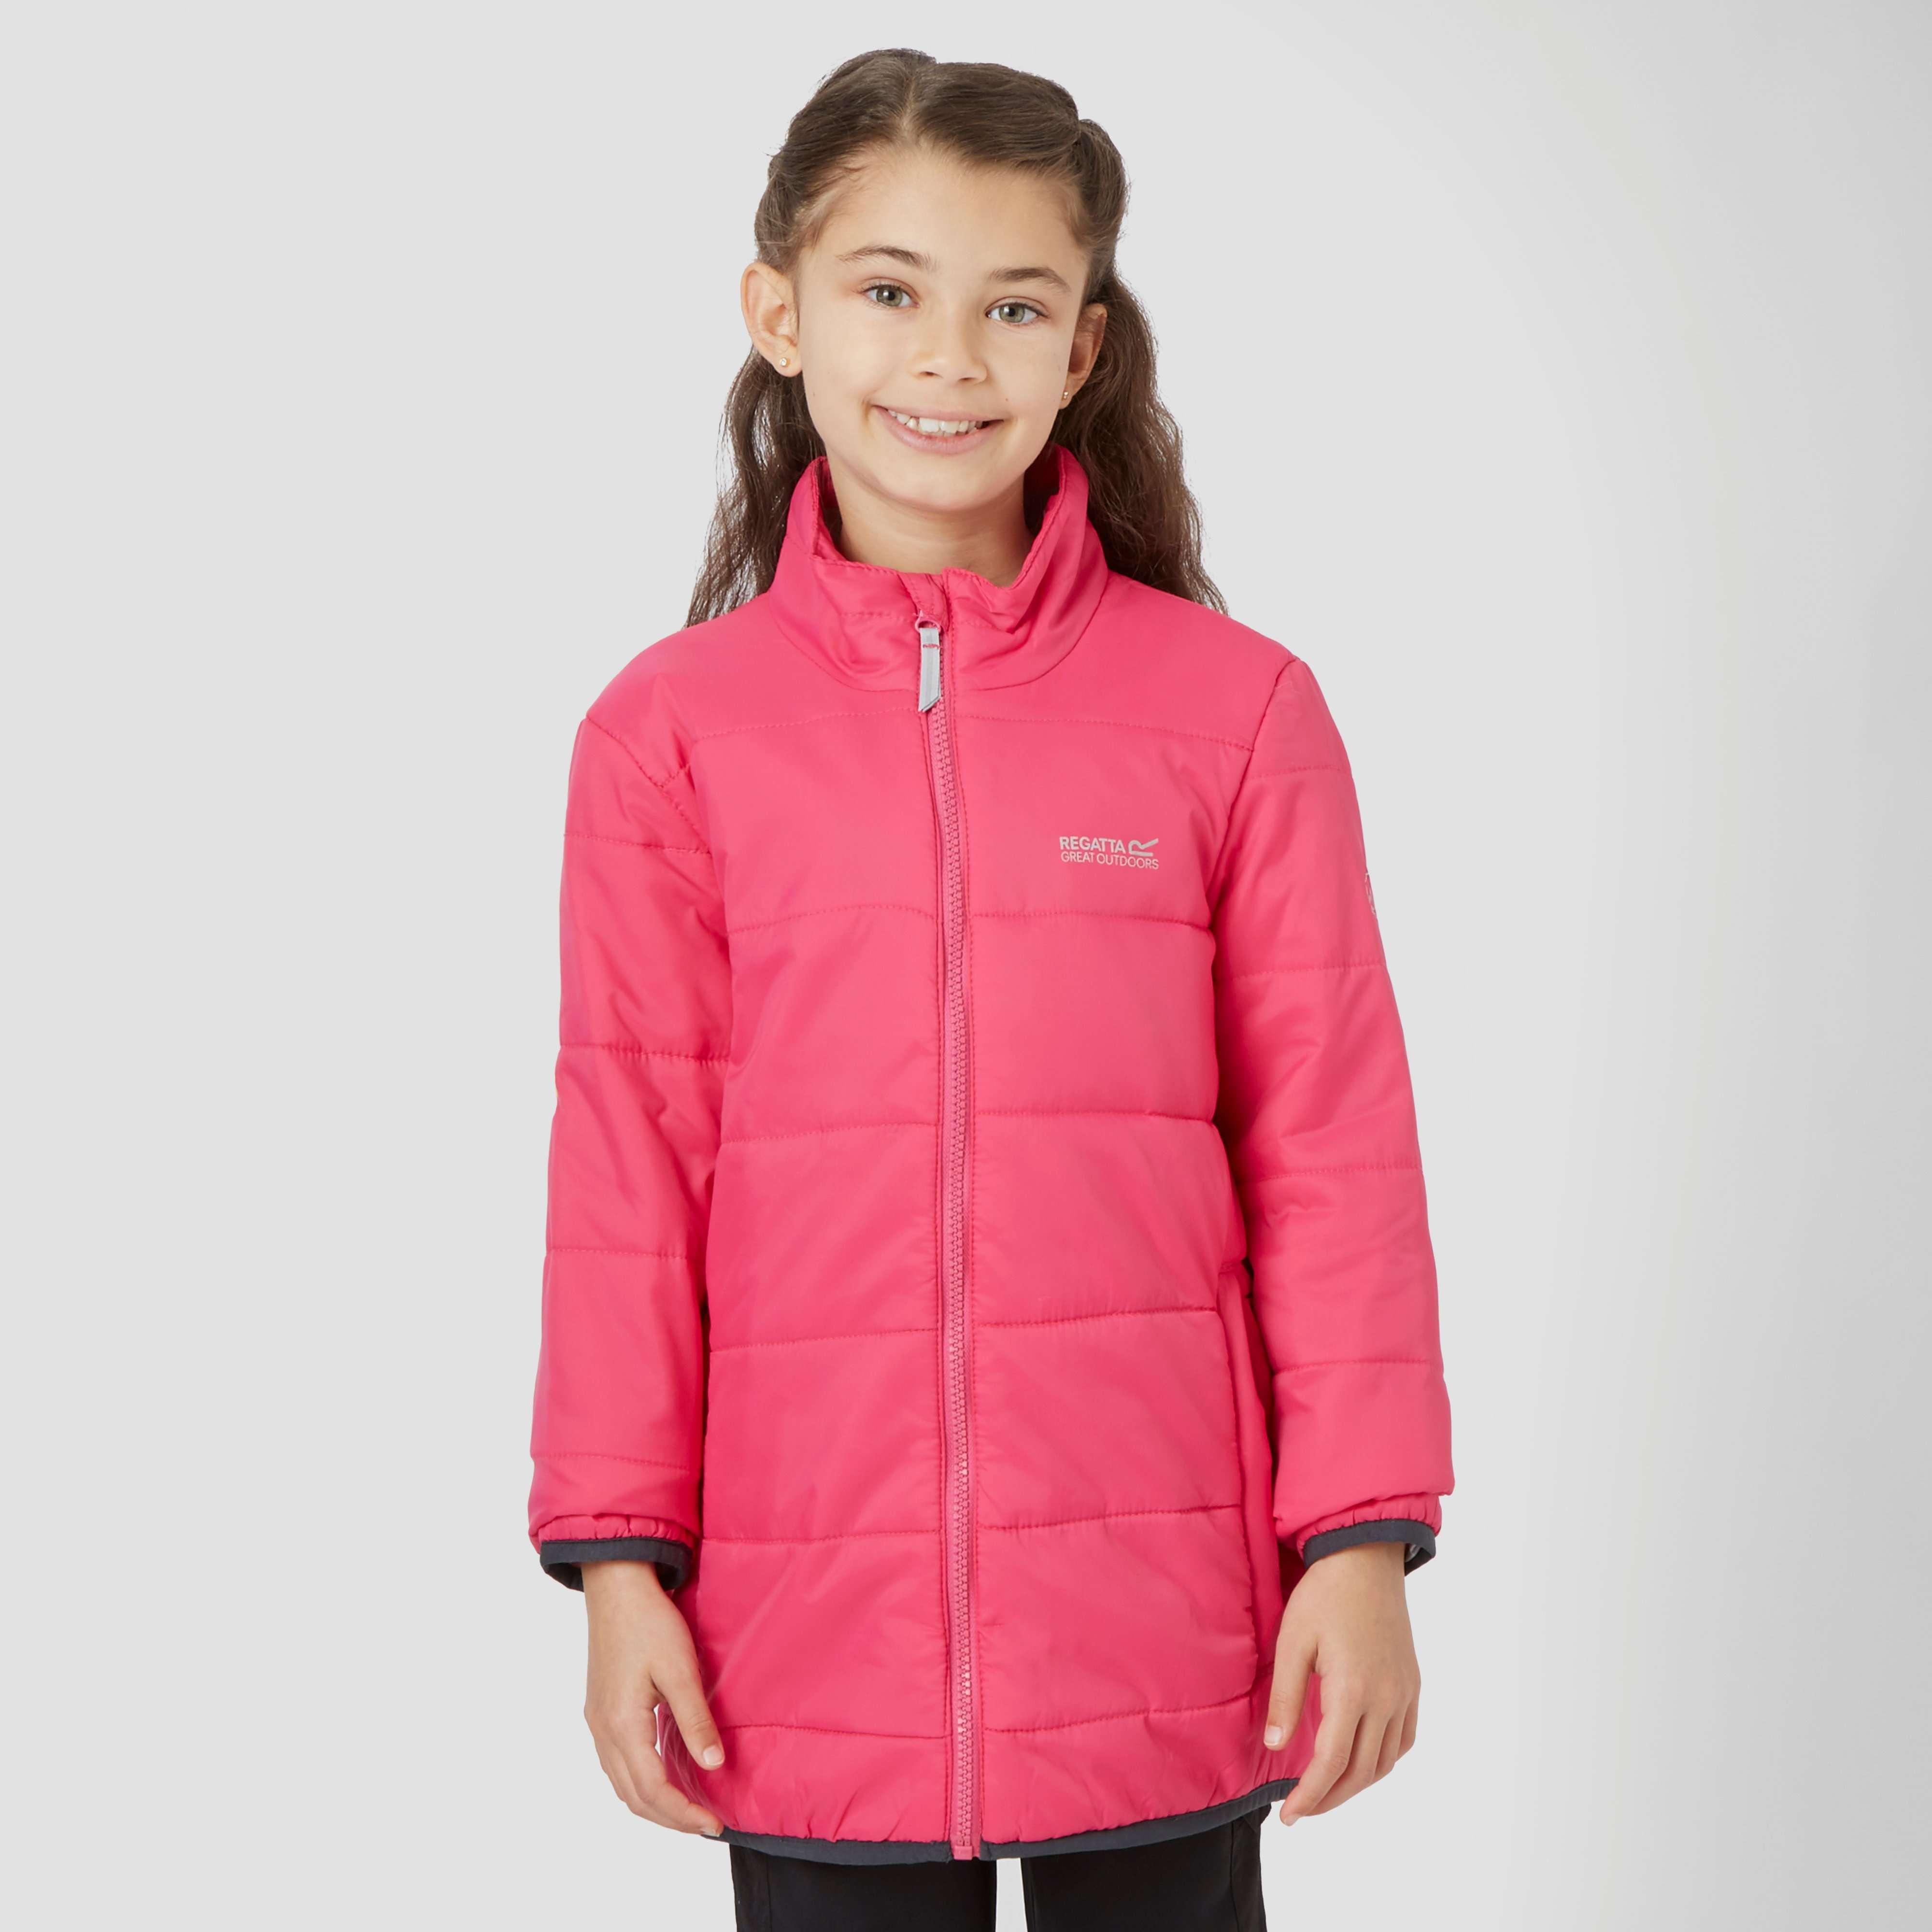 REGATTA Girl's Zyber Insulated Jacket